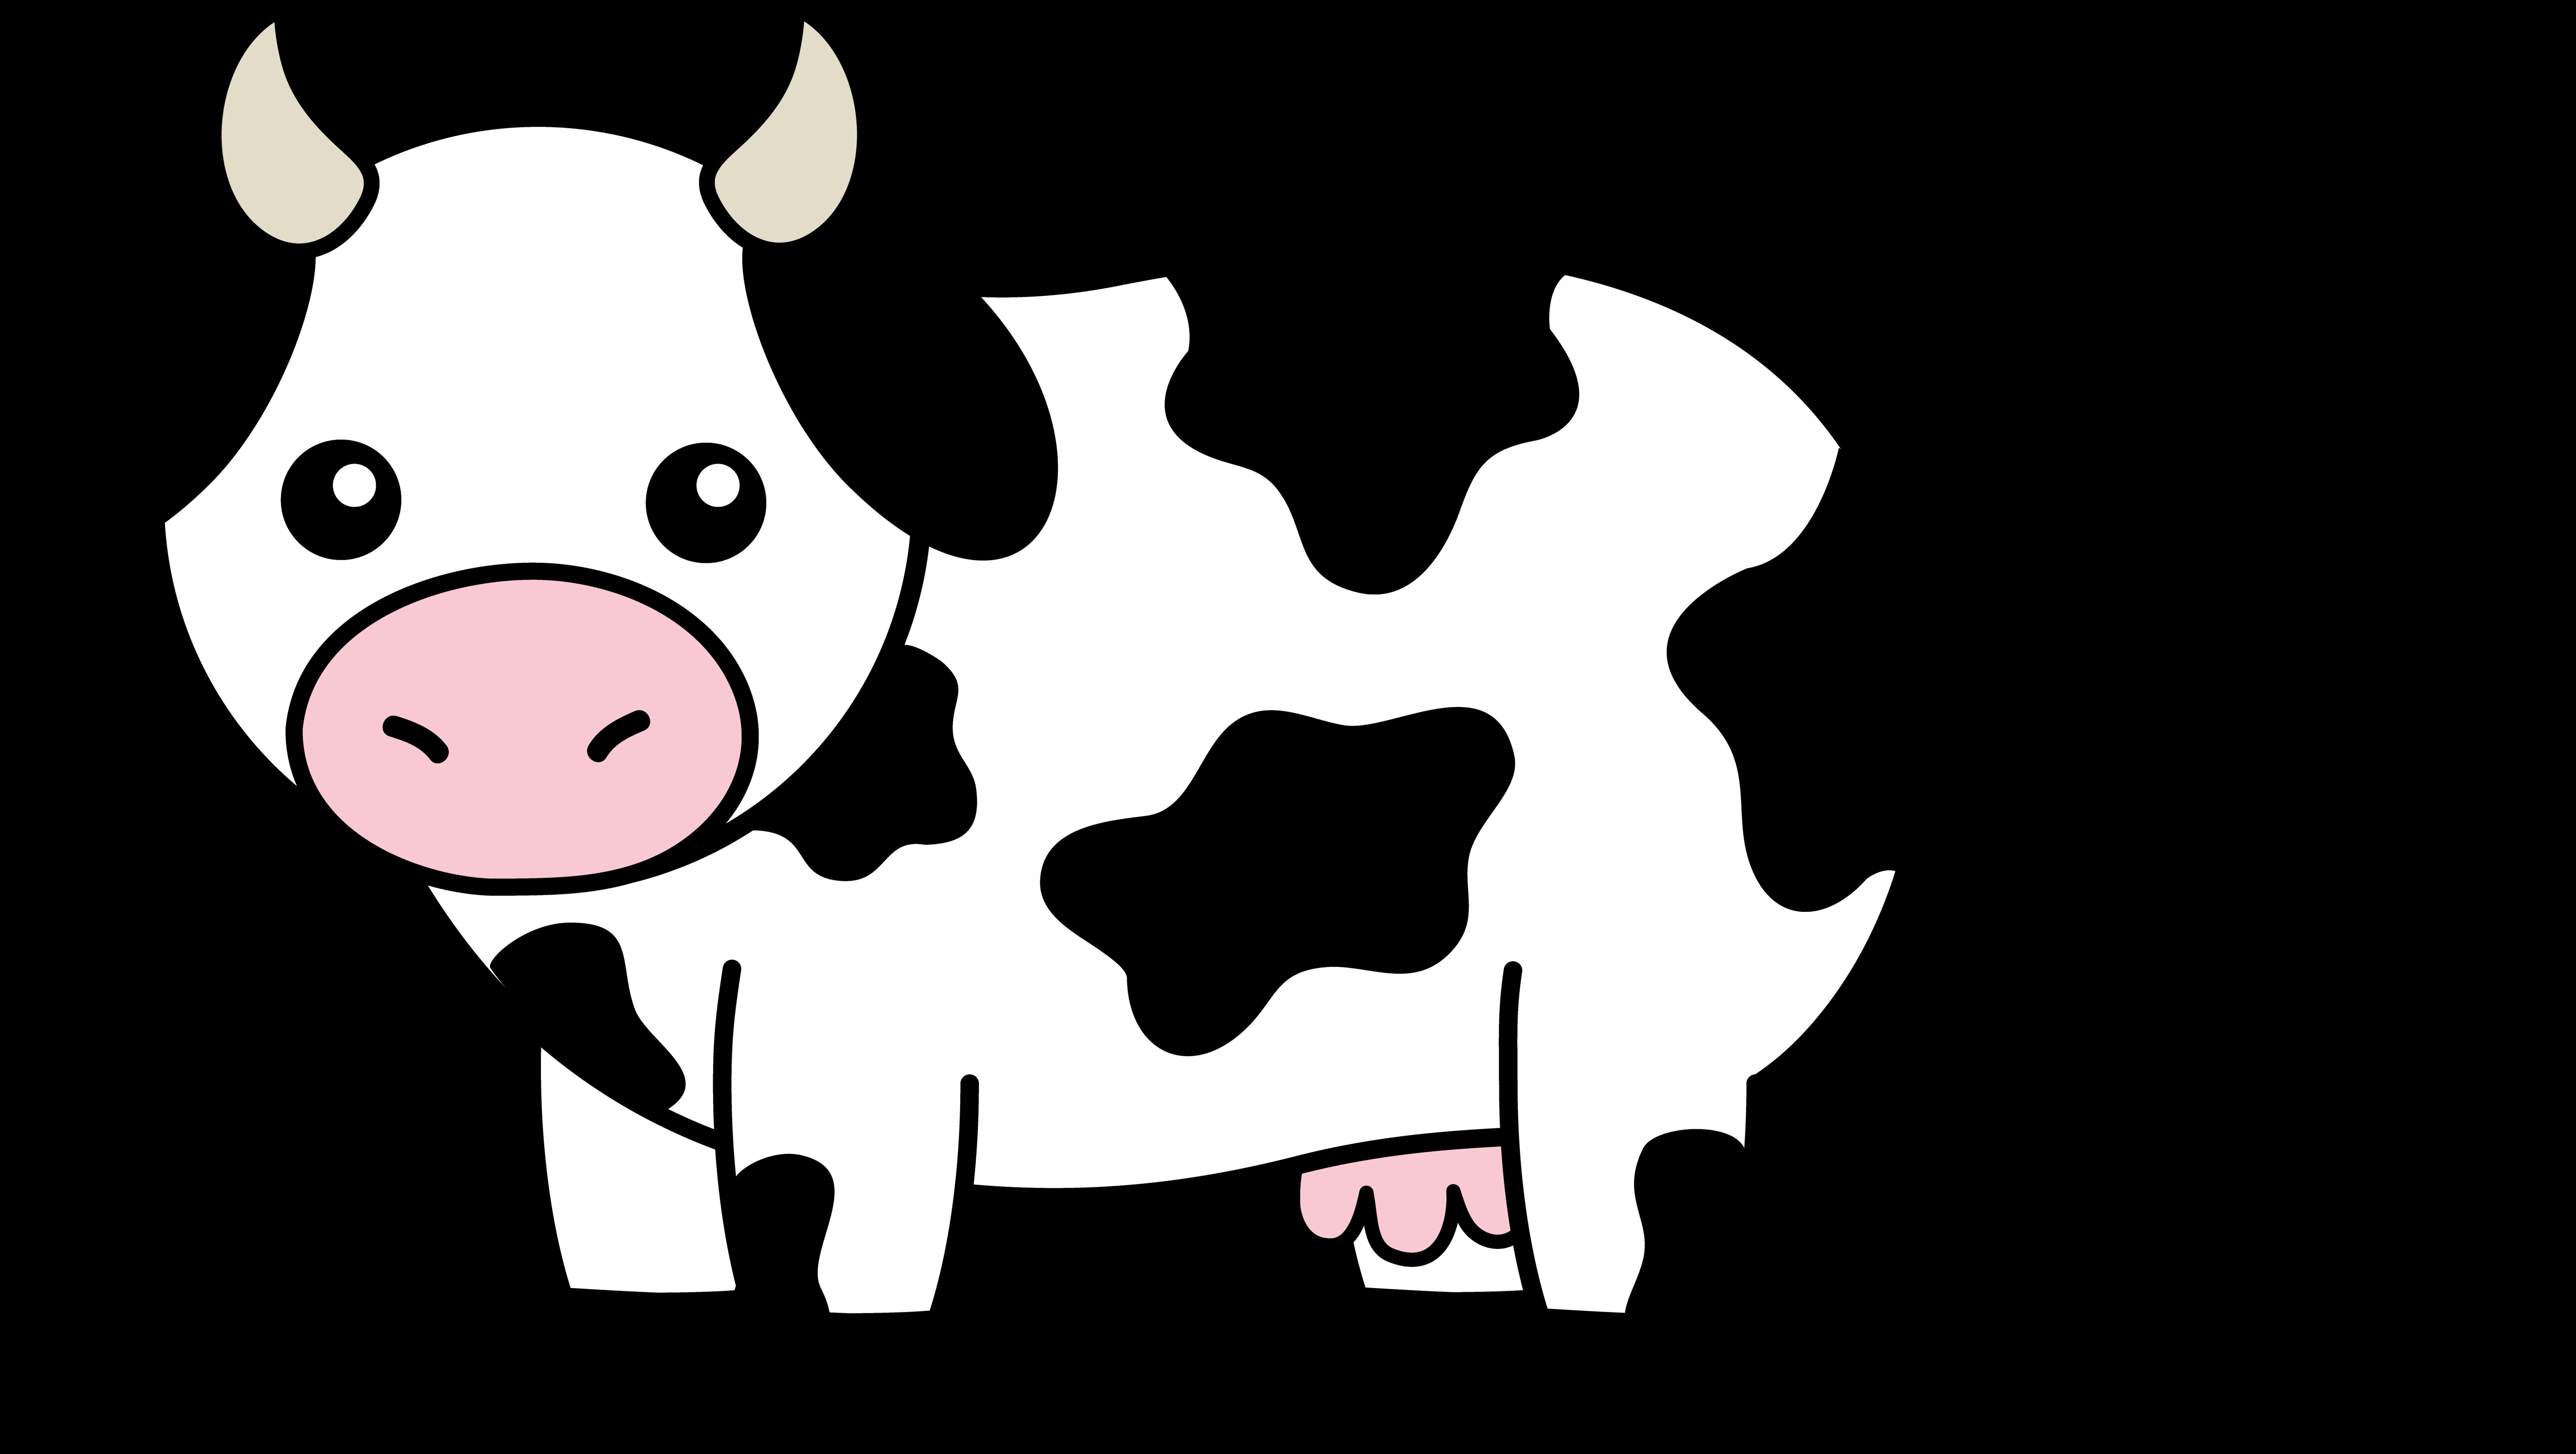 Cow clipart images.